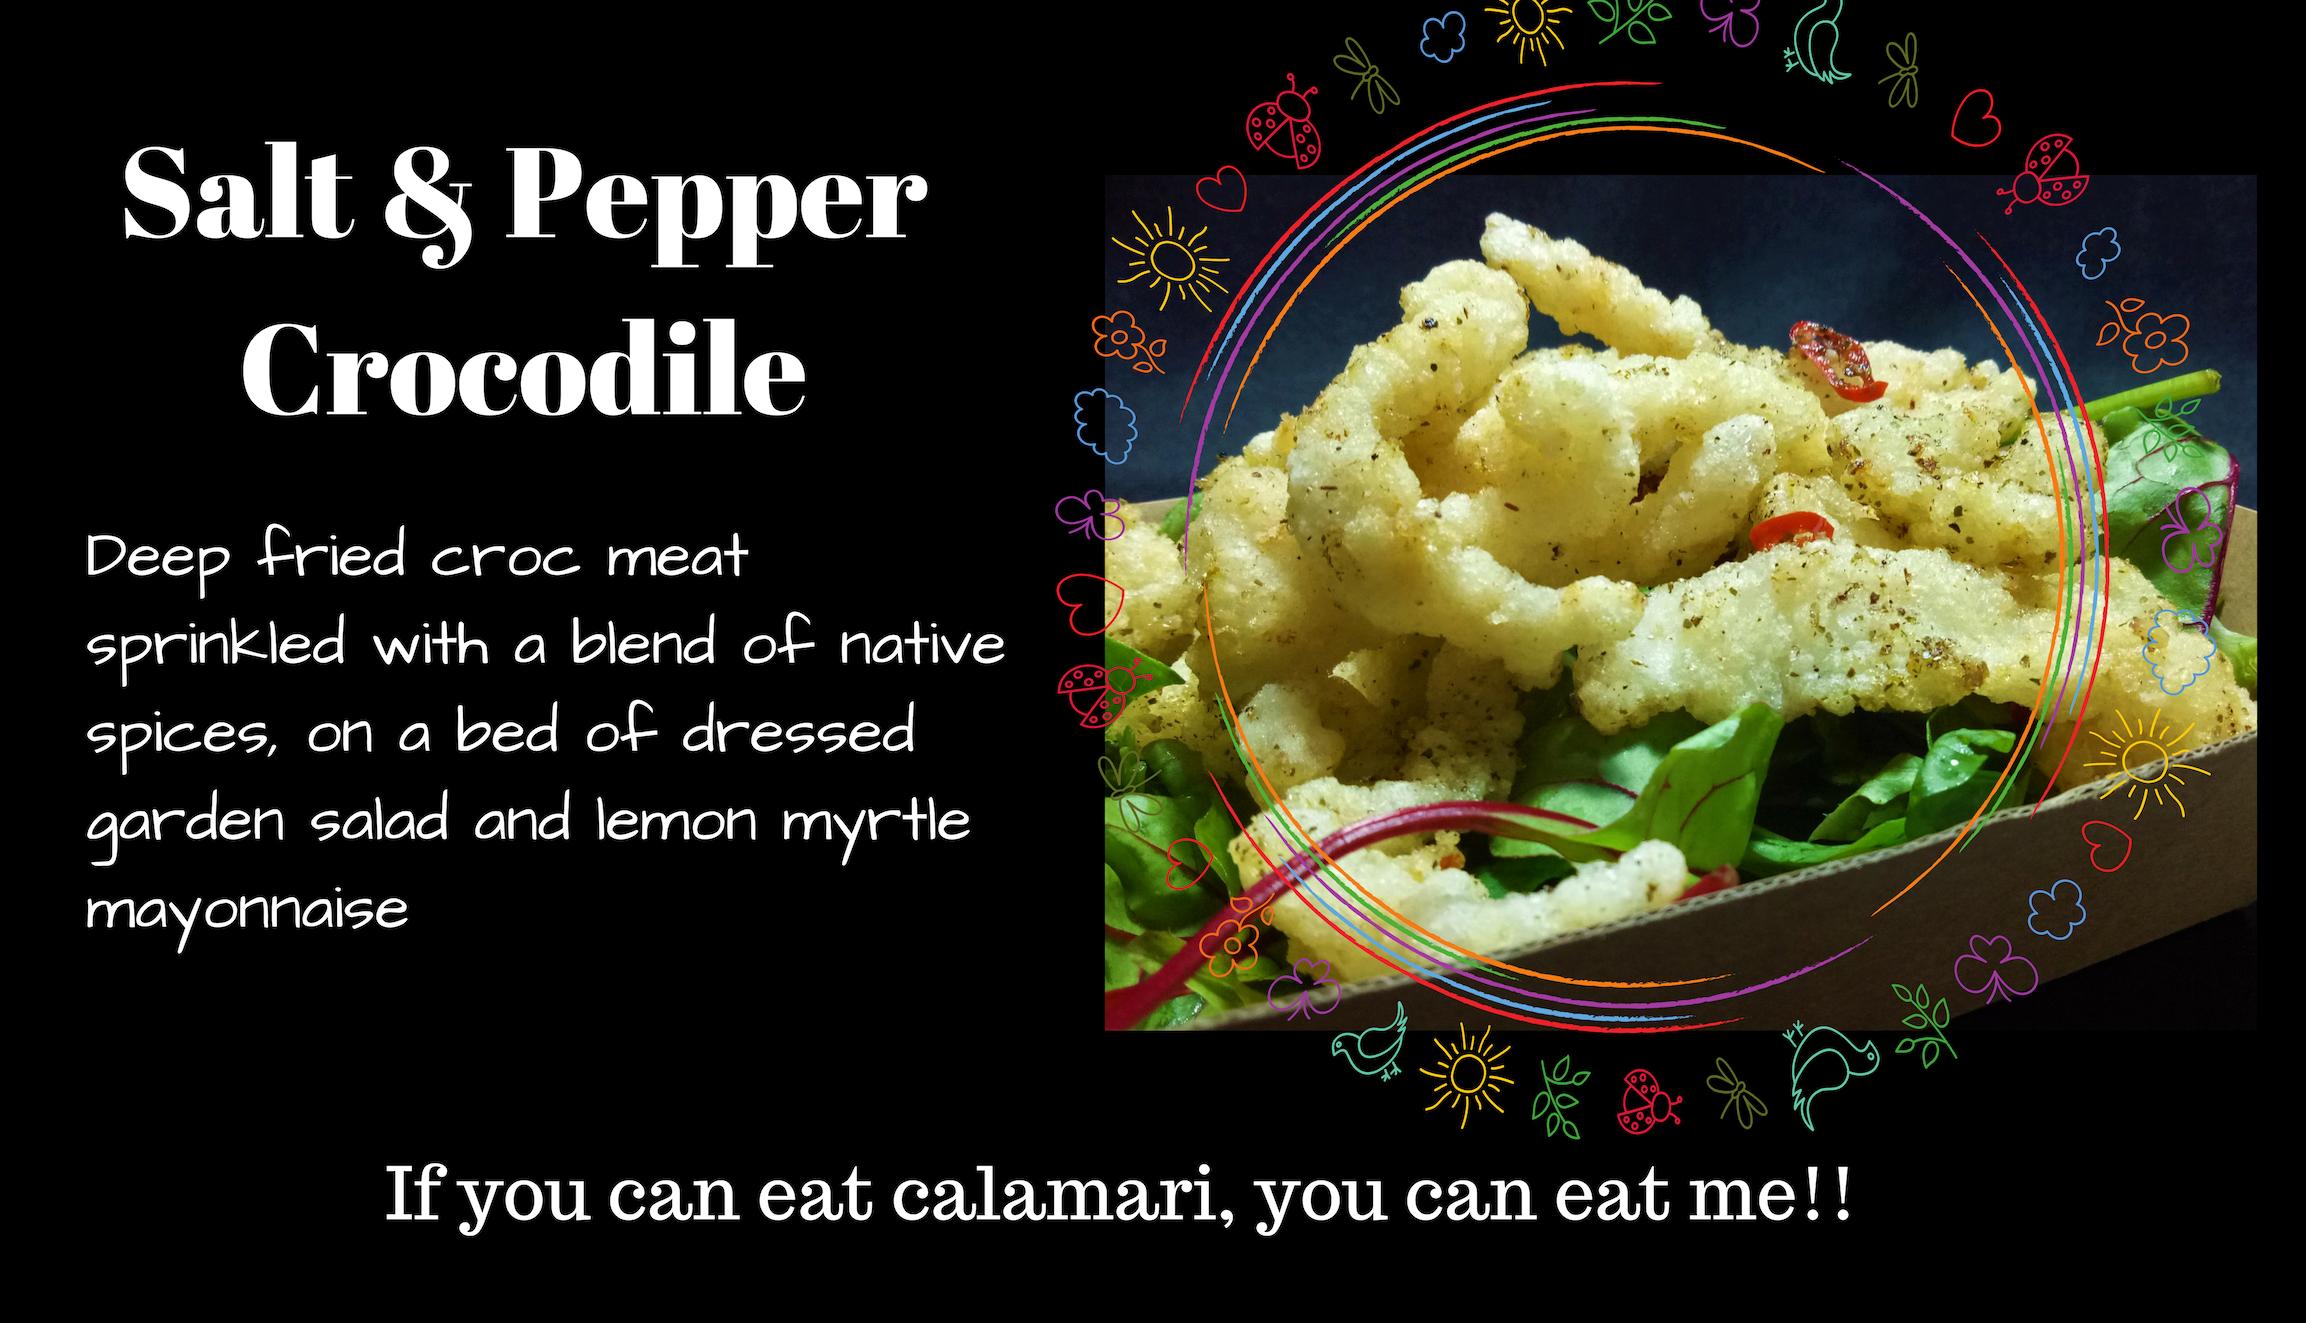 Salt & Pepper (FT) (1).png